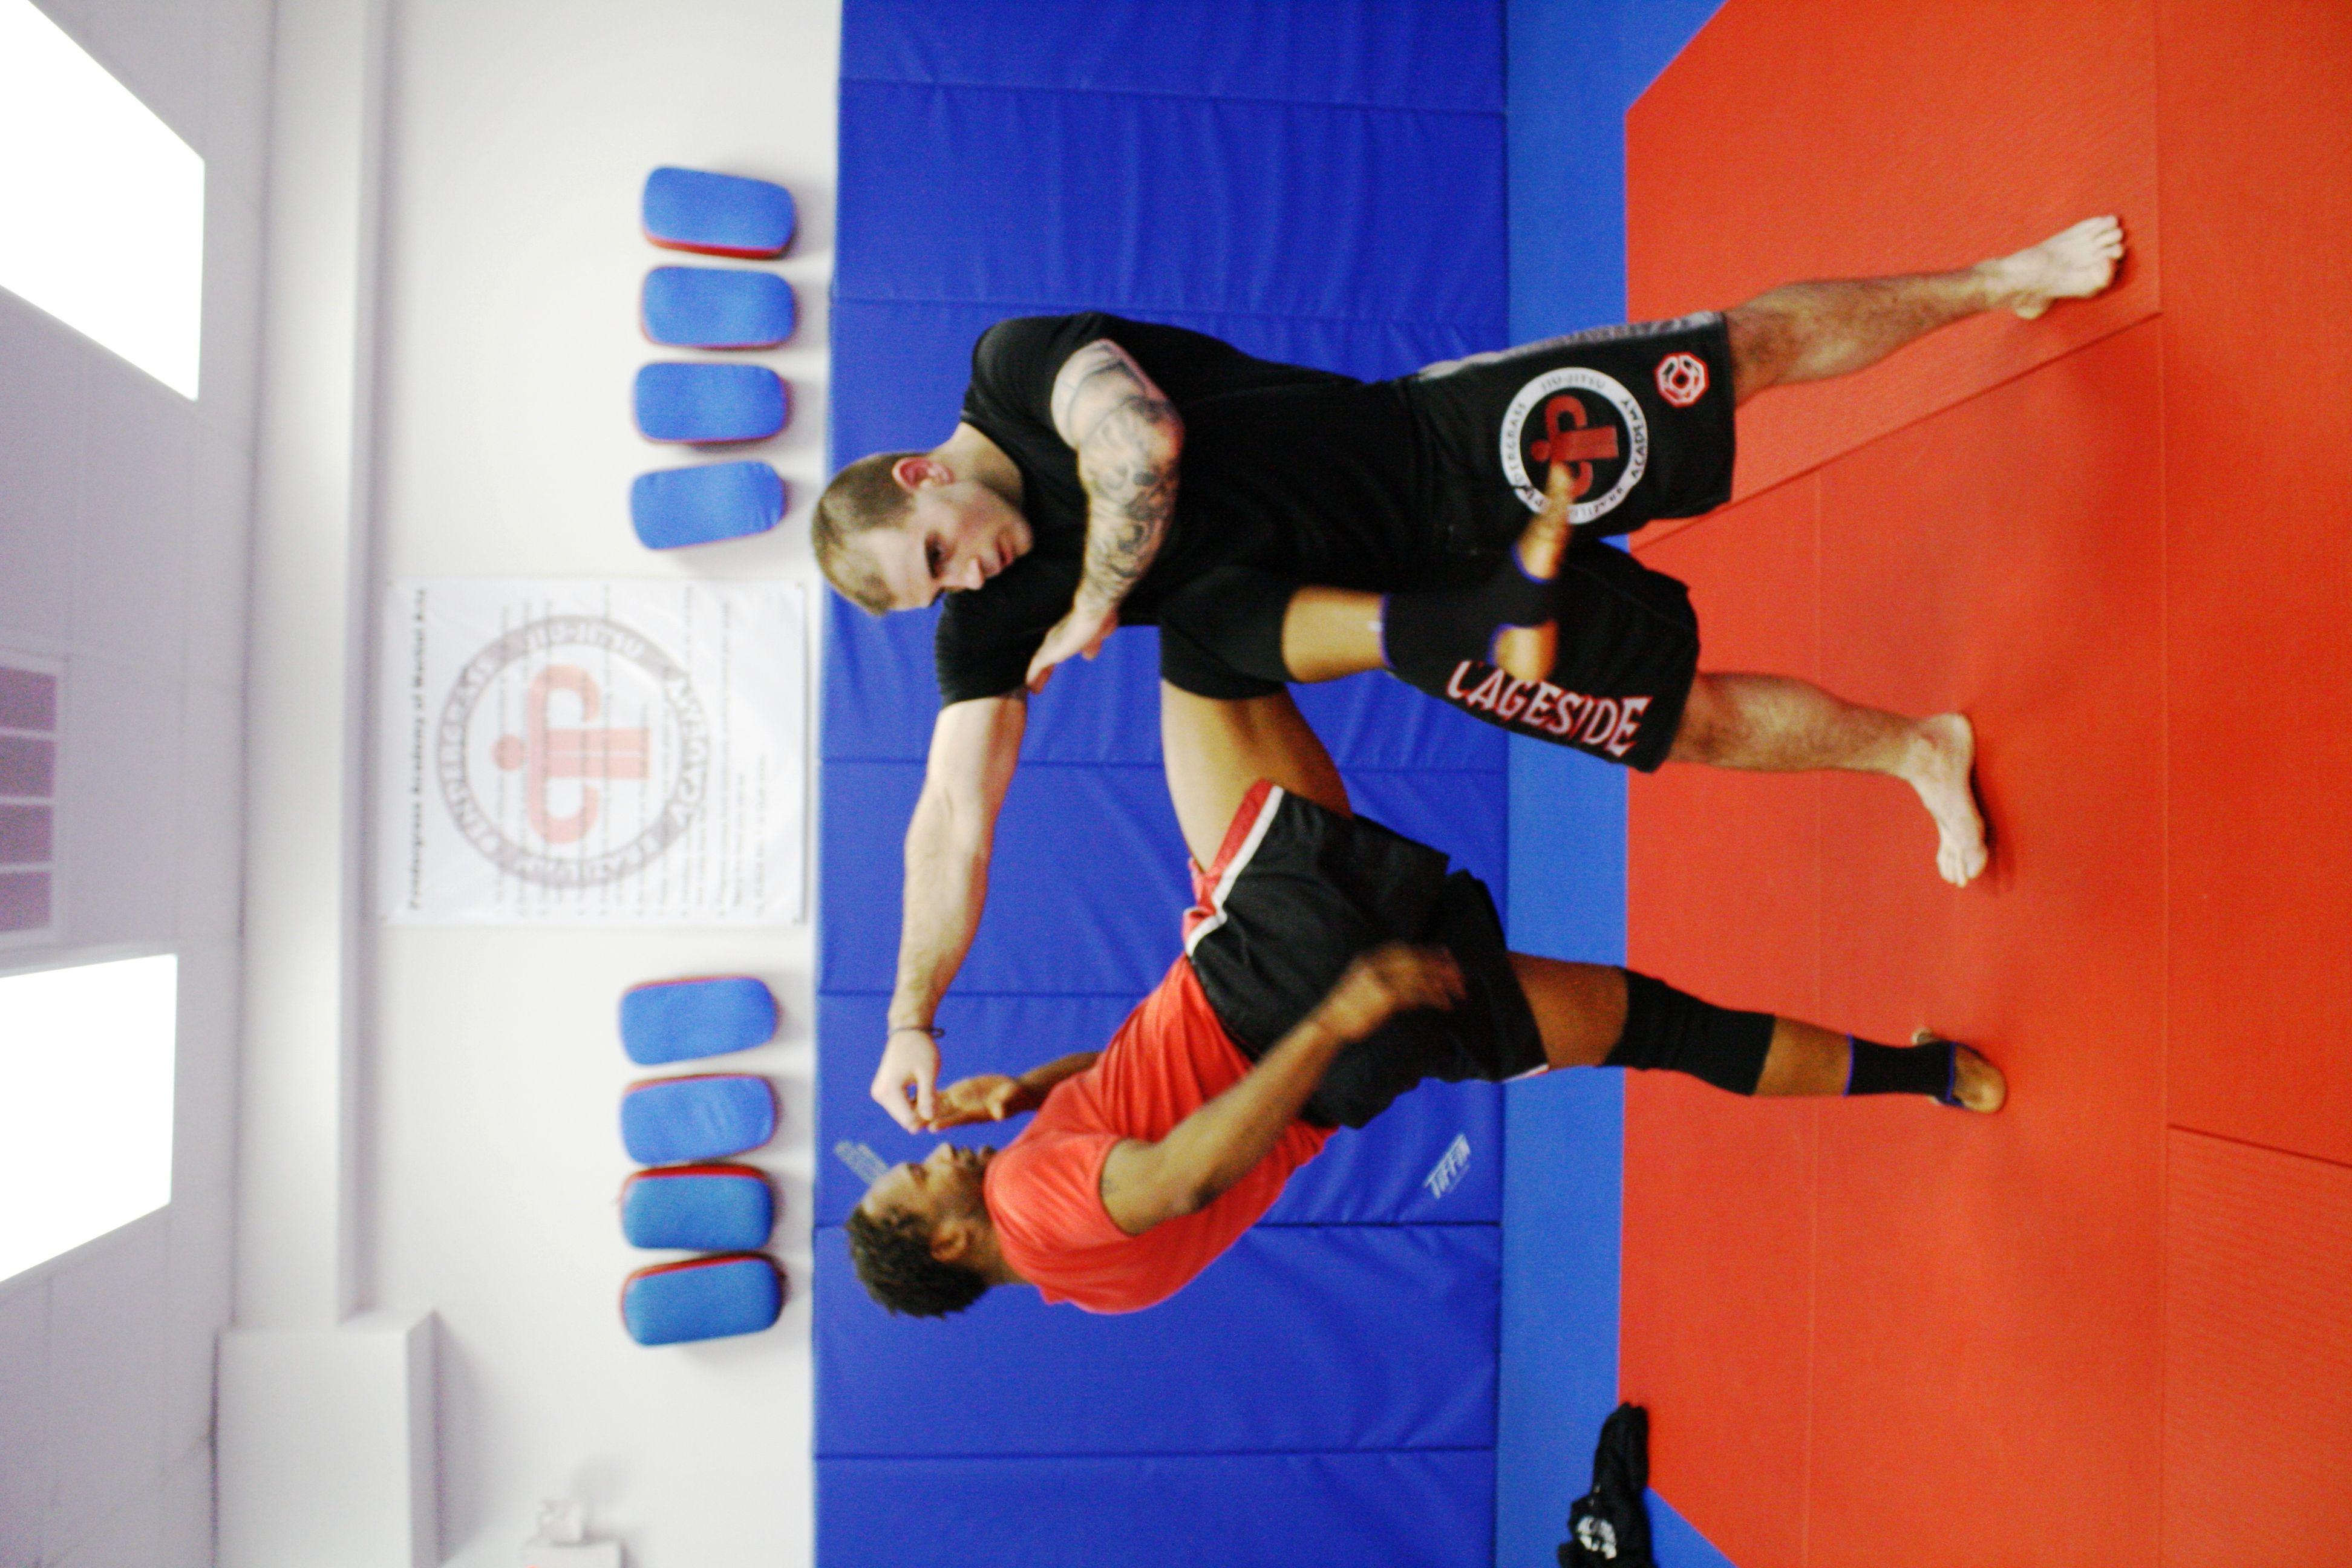 Kru holmes demonstrating the muay thai knee martial